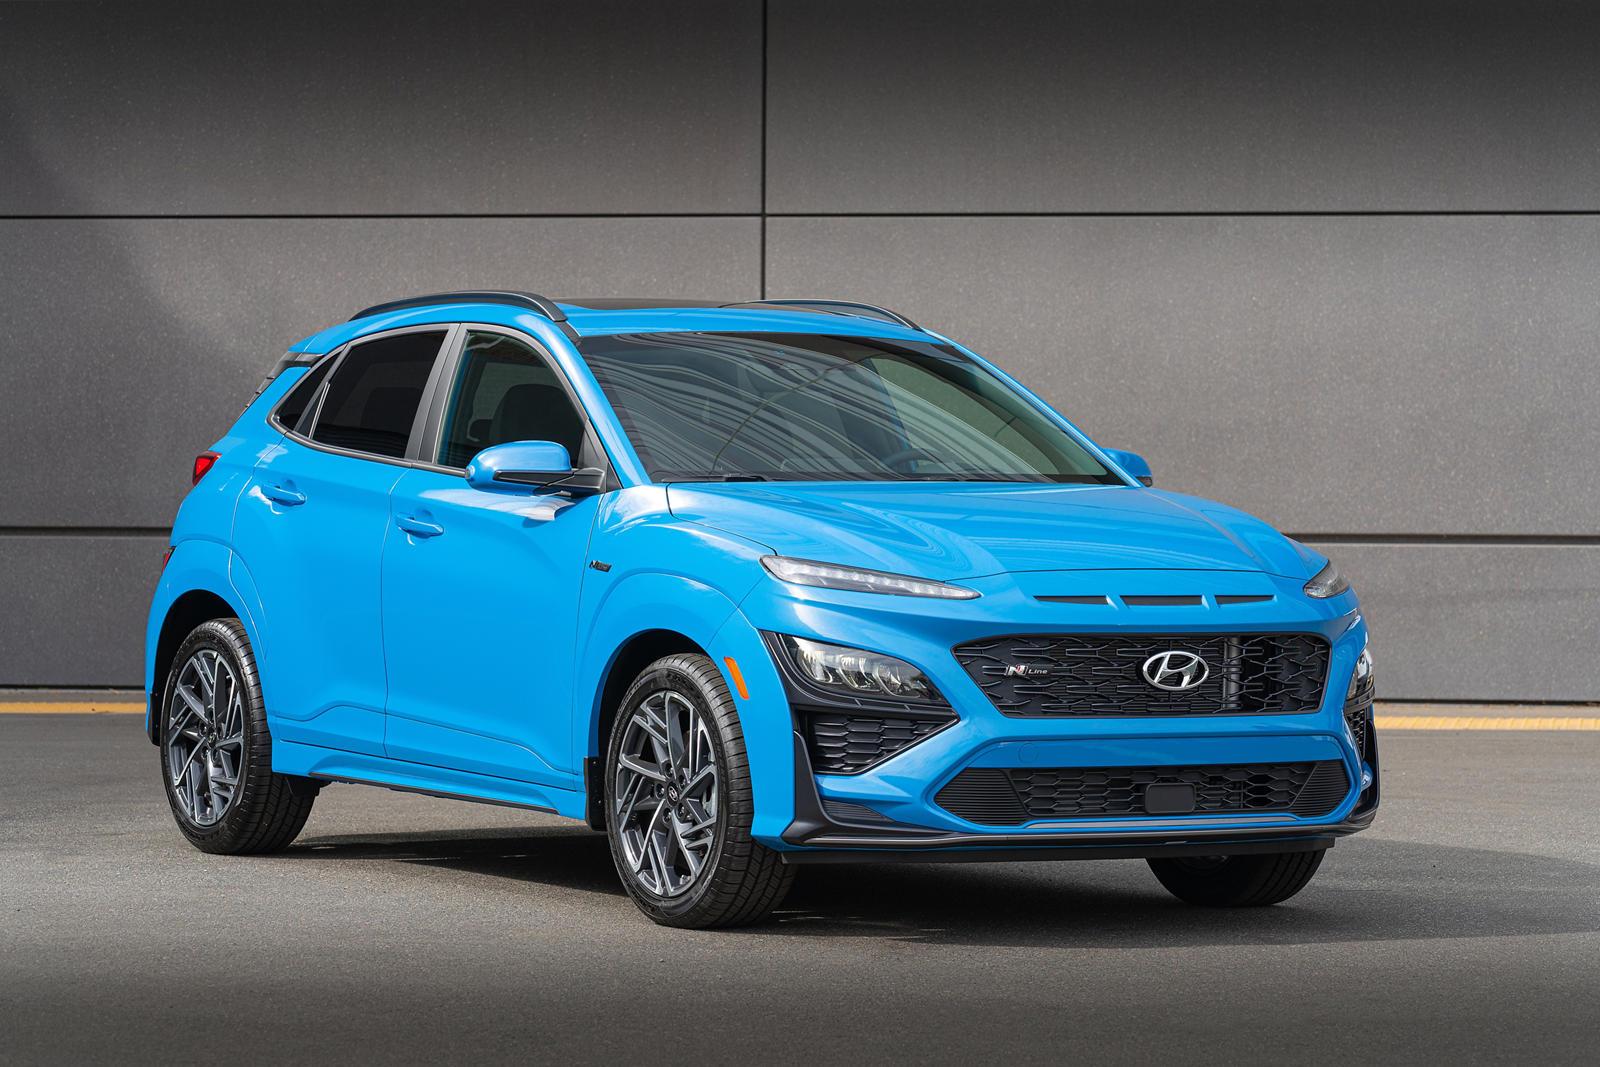 94348 Hyundai Updates Kona and Kona Electric For 2022